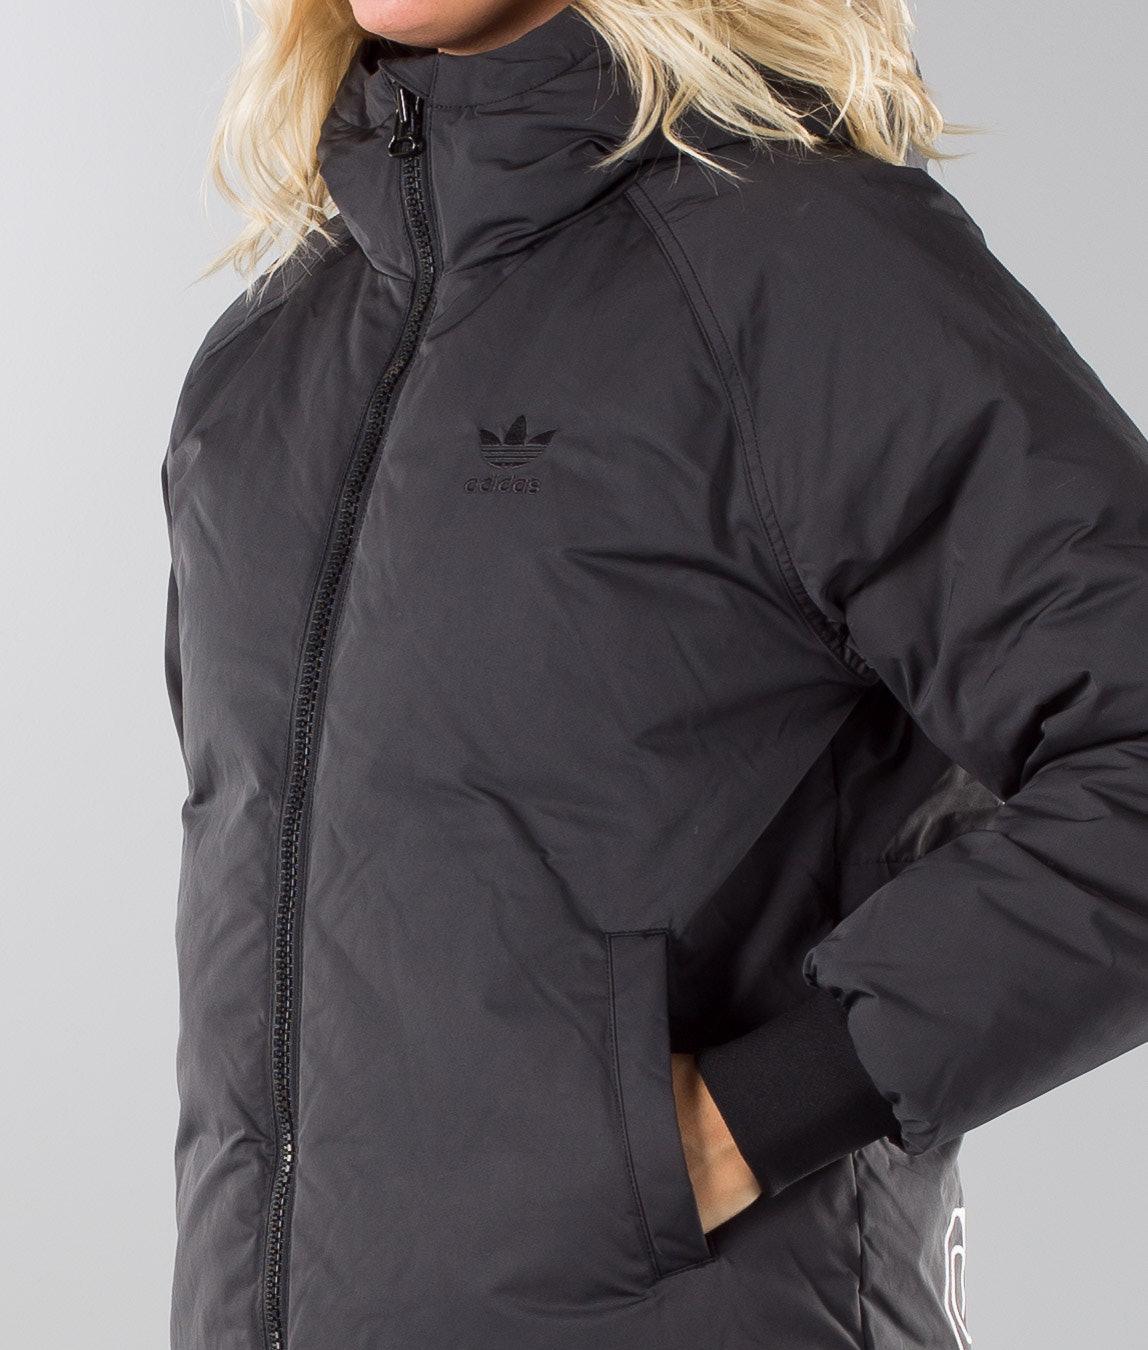 2a2b5140bfbd Adidas Originals Short Down Jacket Black - Ridestore.com